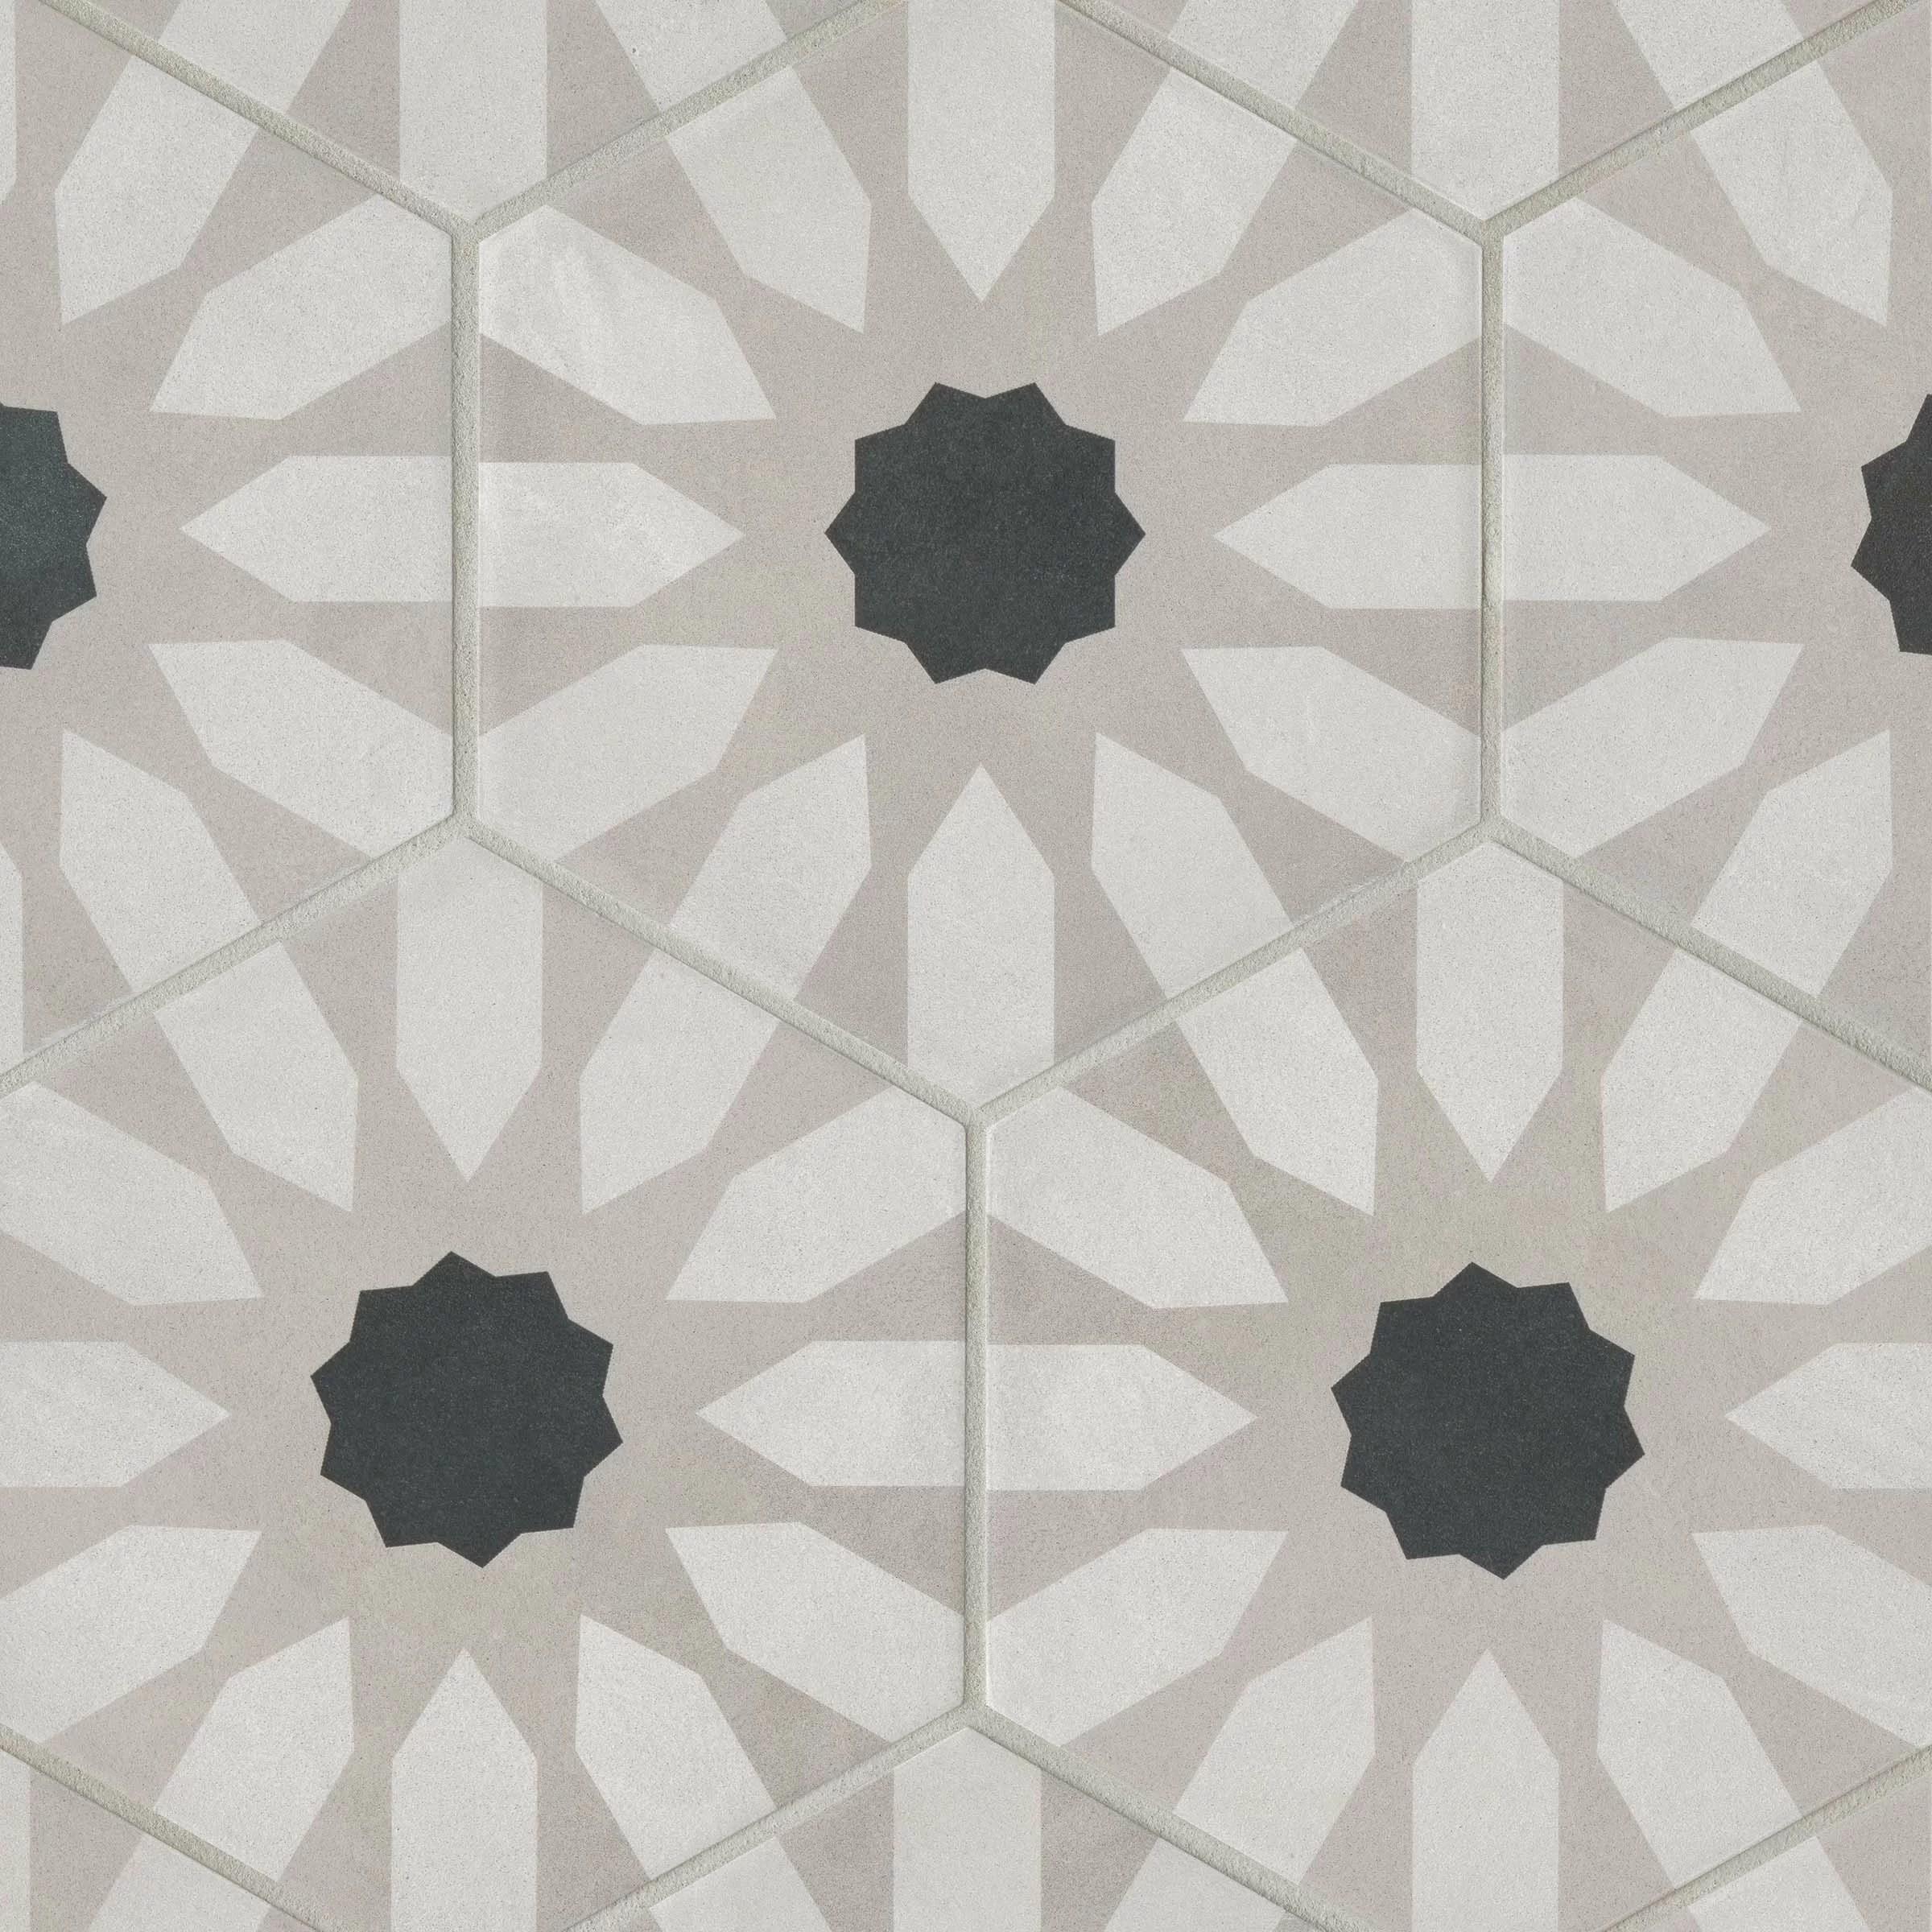 allora 9 x 10 porcelain patterned wall floor tile